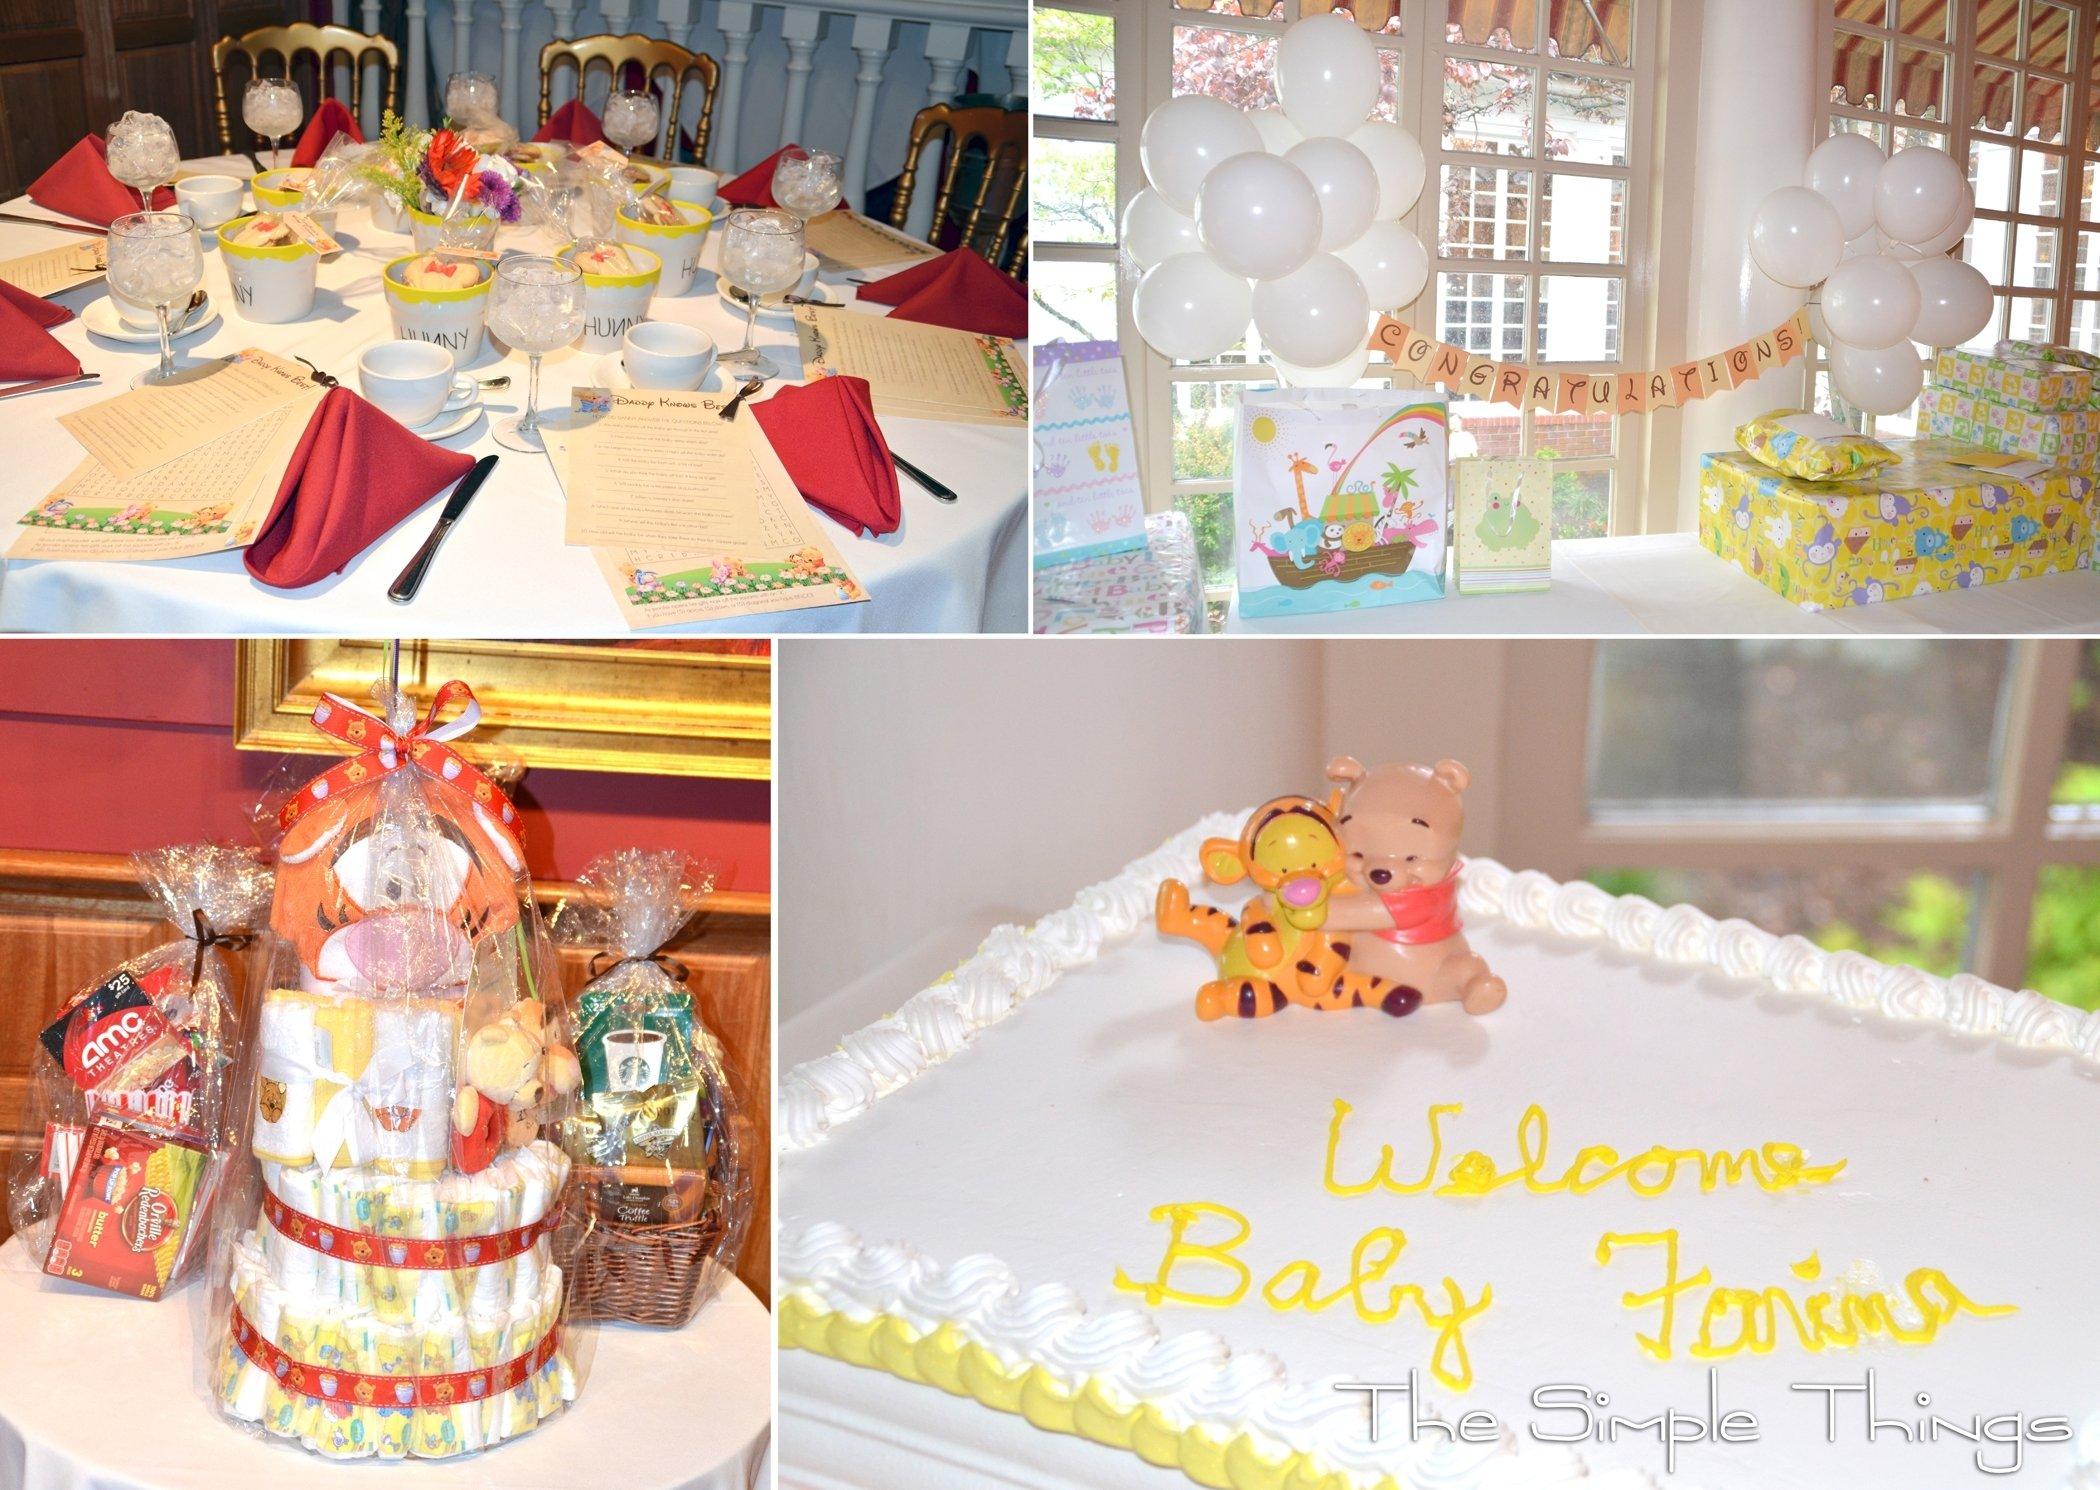 10 Wonderful Classic Winnie The Pooh Baby Shower Ideas photo winnie the pooh baby image 1 2020